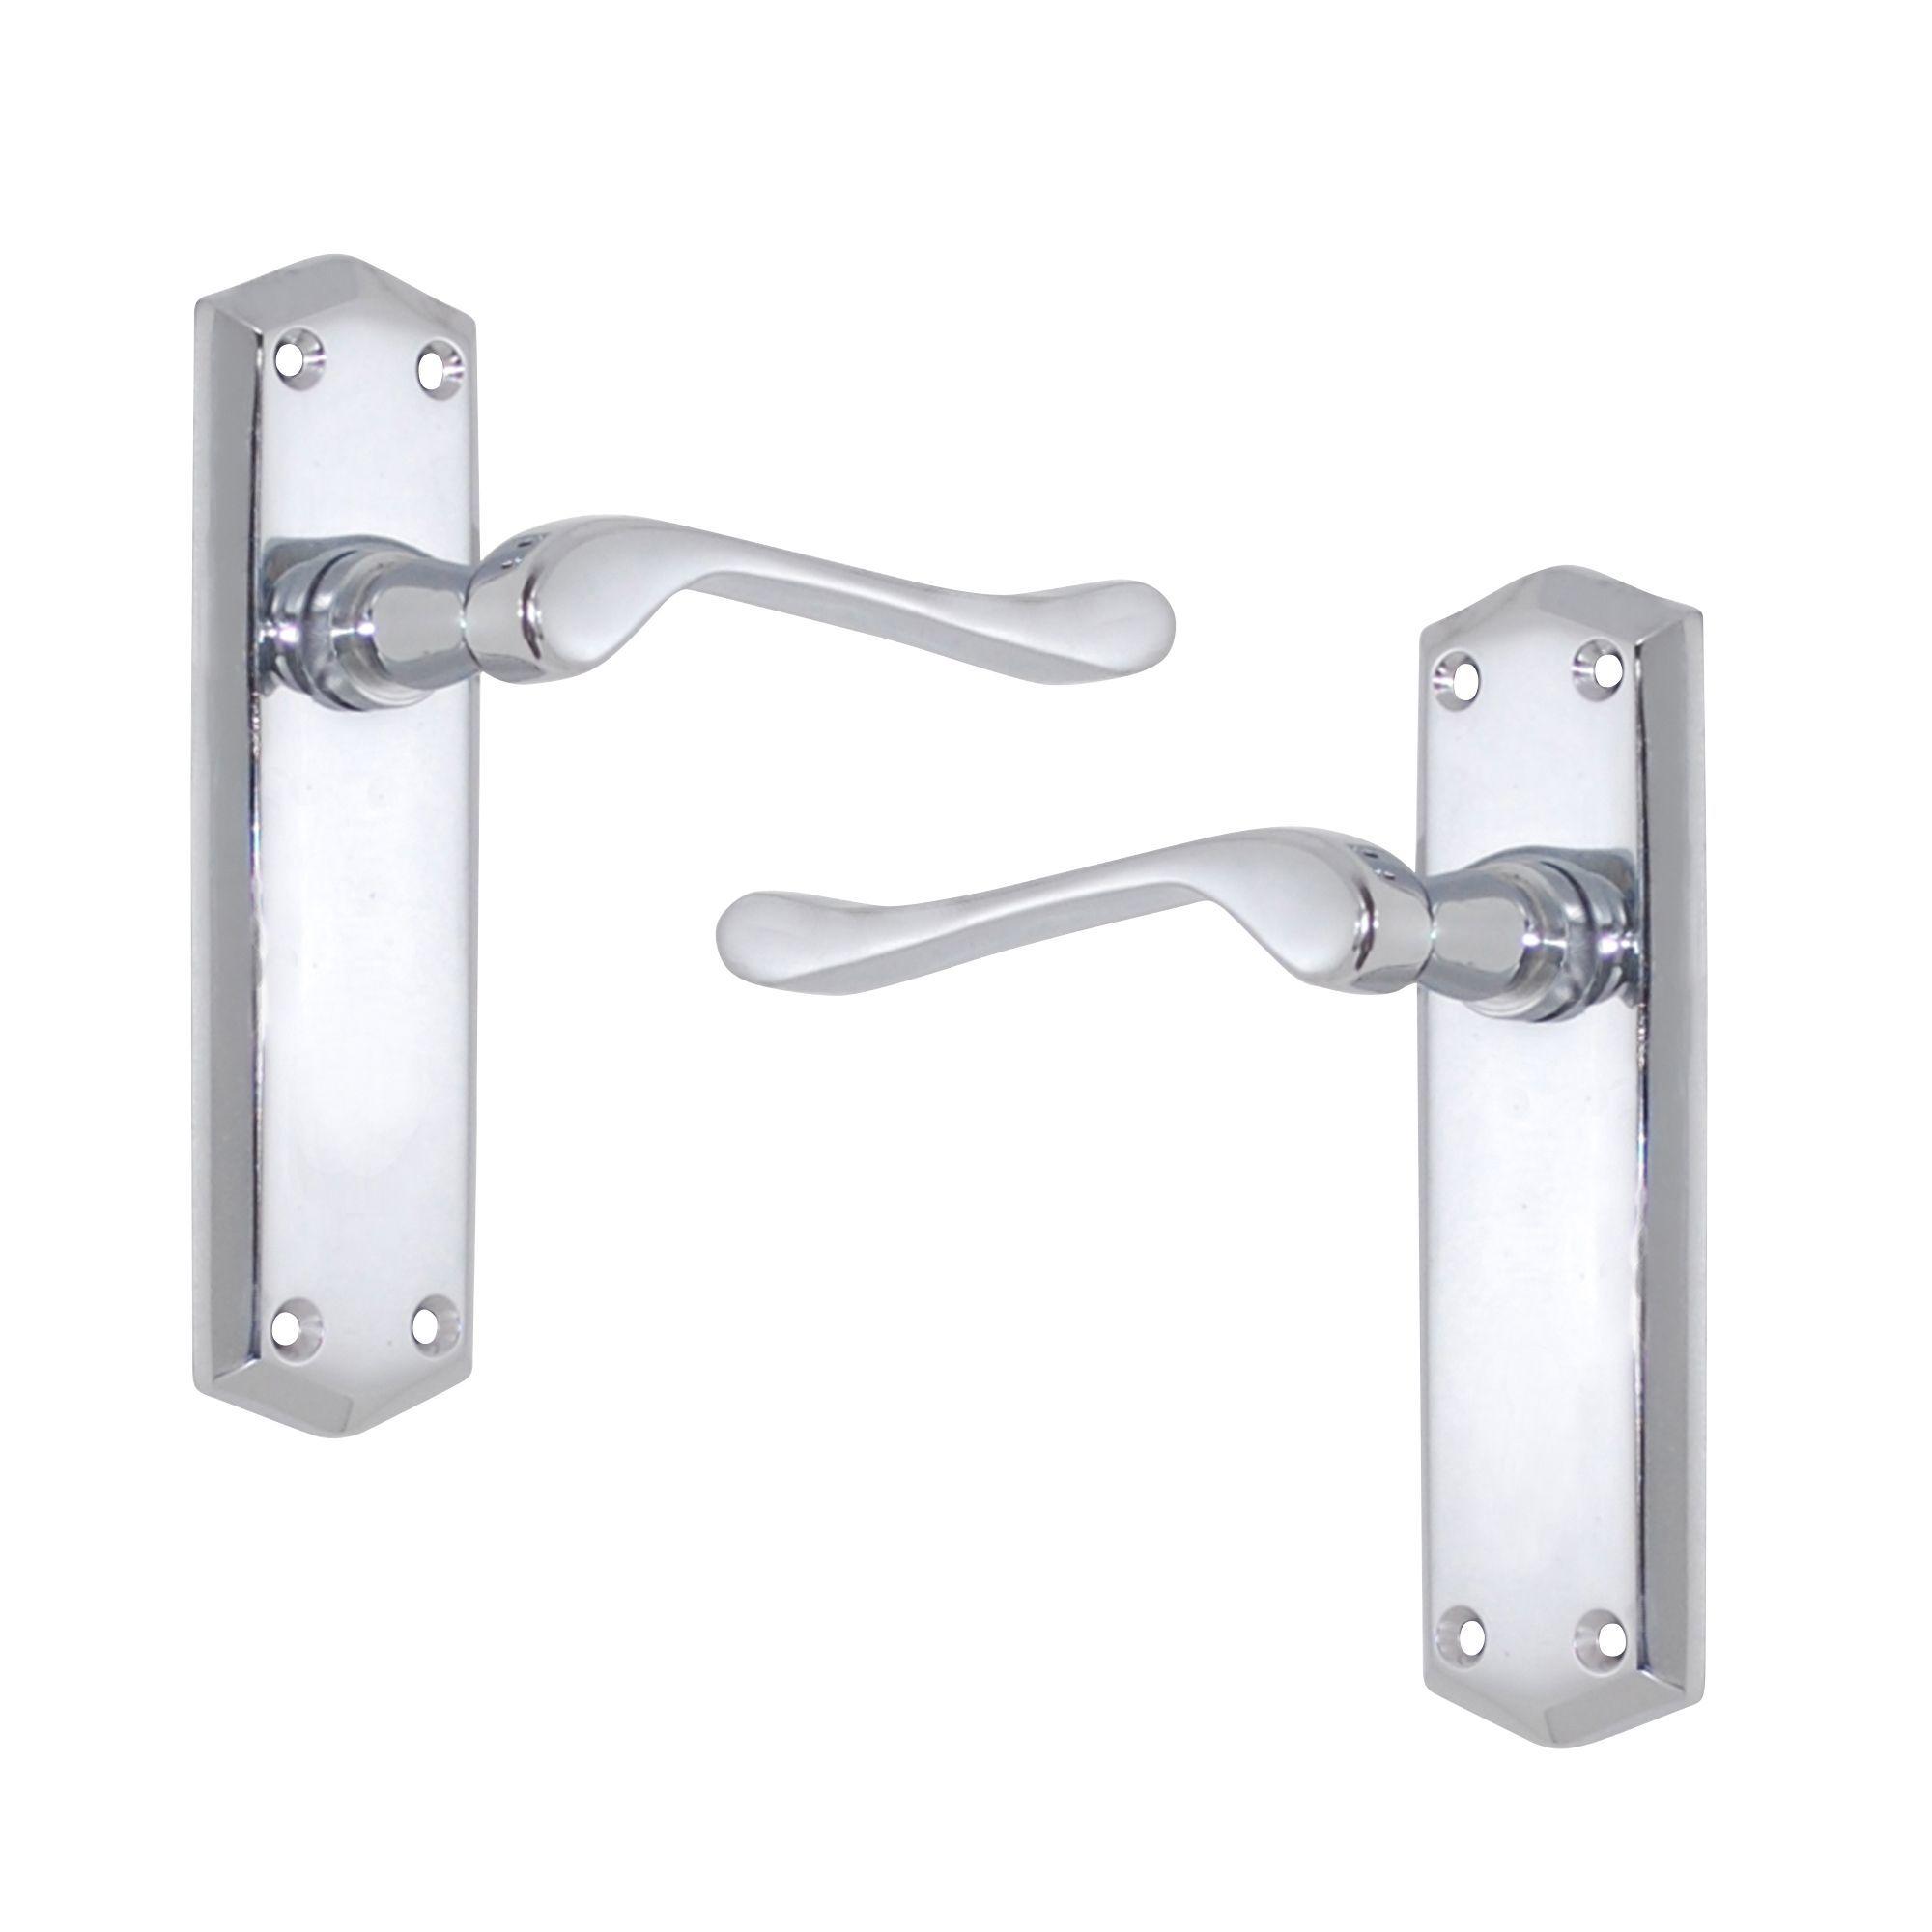 Polished Chrome Effect Internal Scroll Latch Door Handle, 1 Set |  Departments | DIY at B&Q